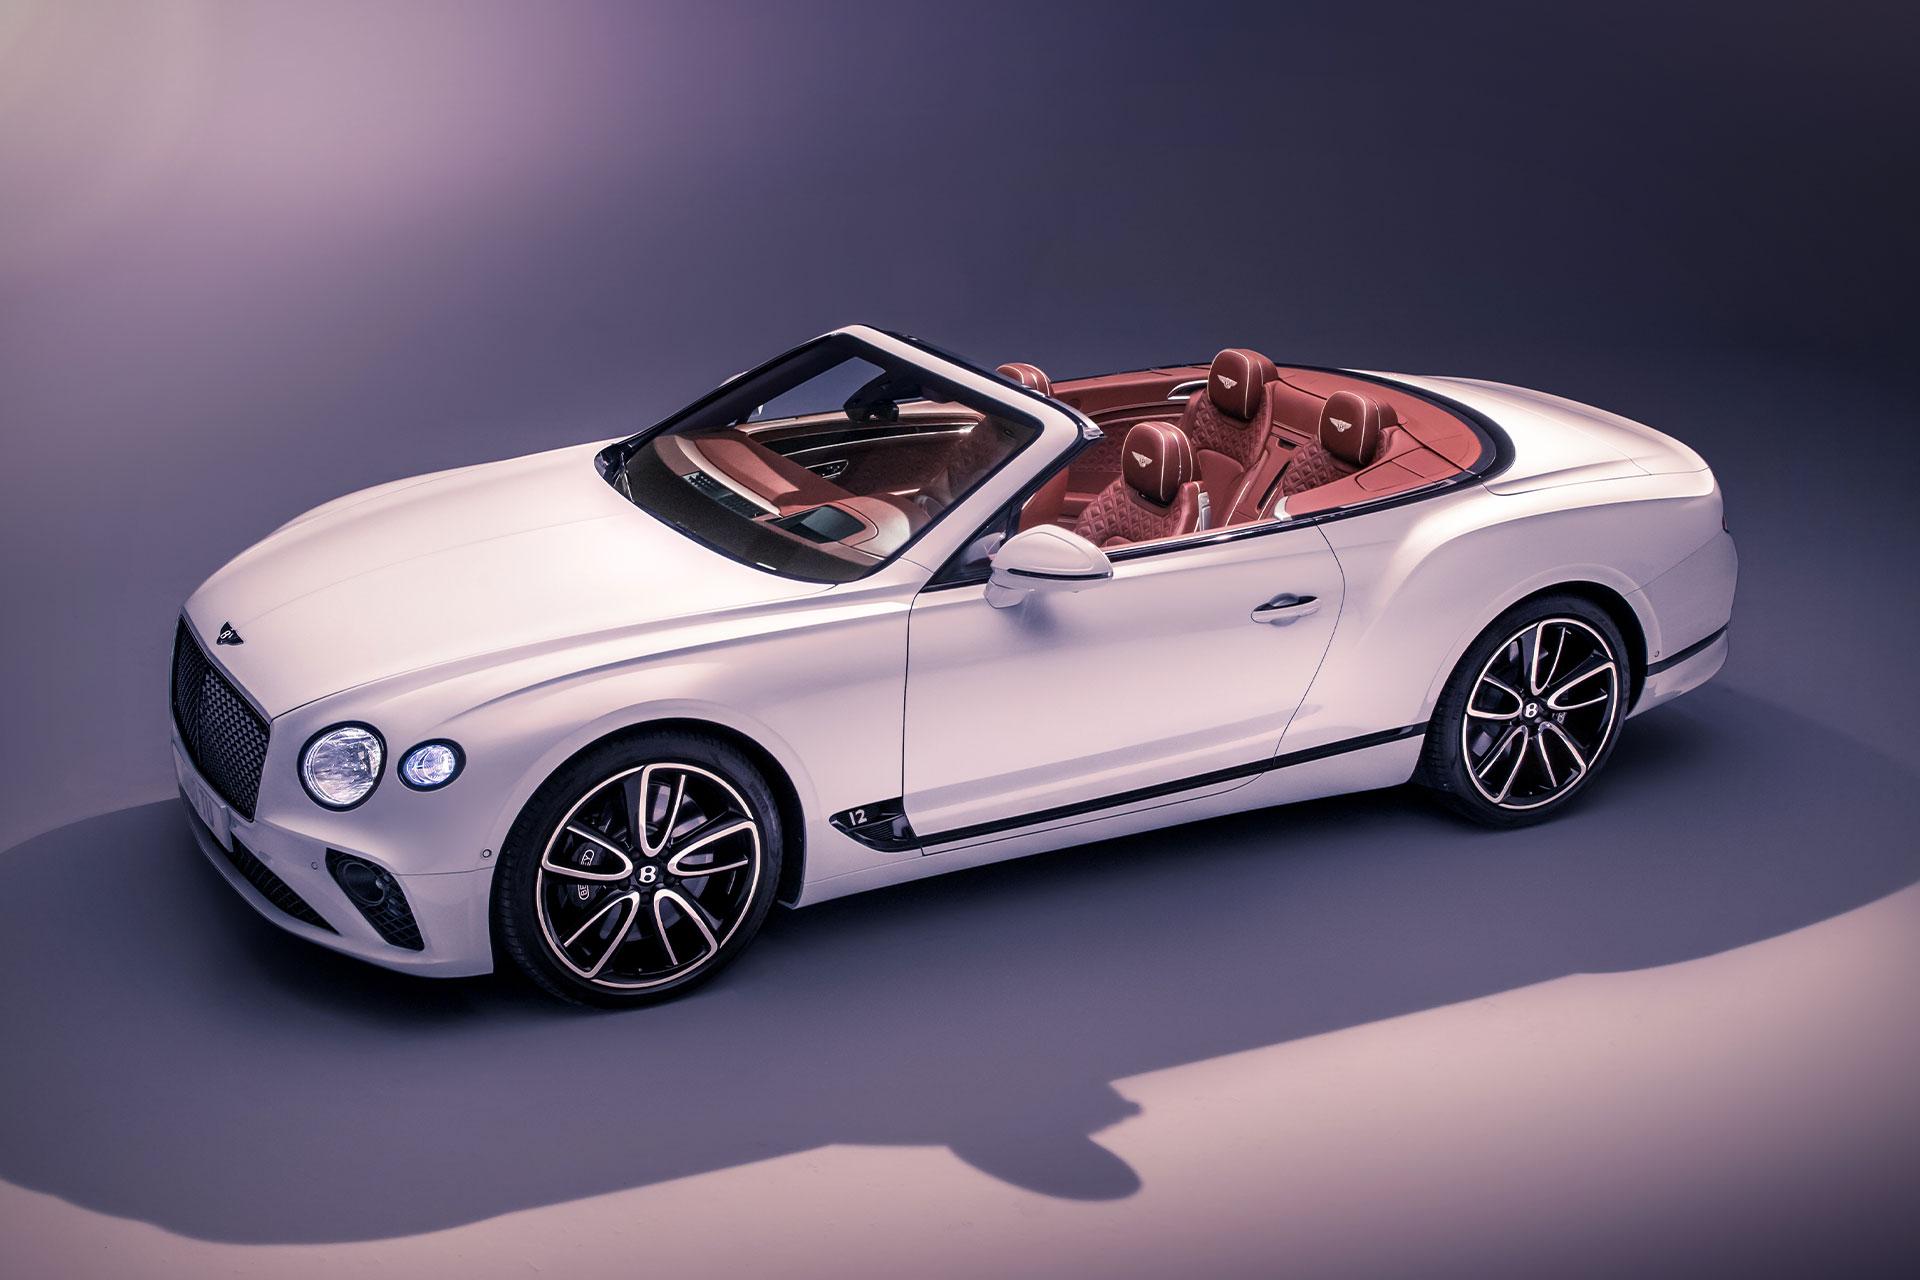 Fixed Gear Wallpaper Iphone 2019 Bentley Continental Gt Convertible Uncrate